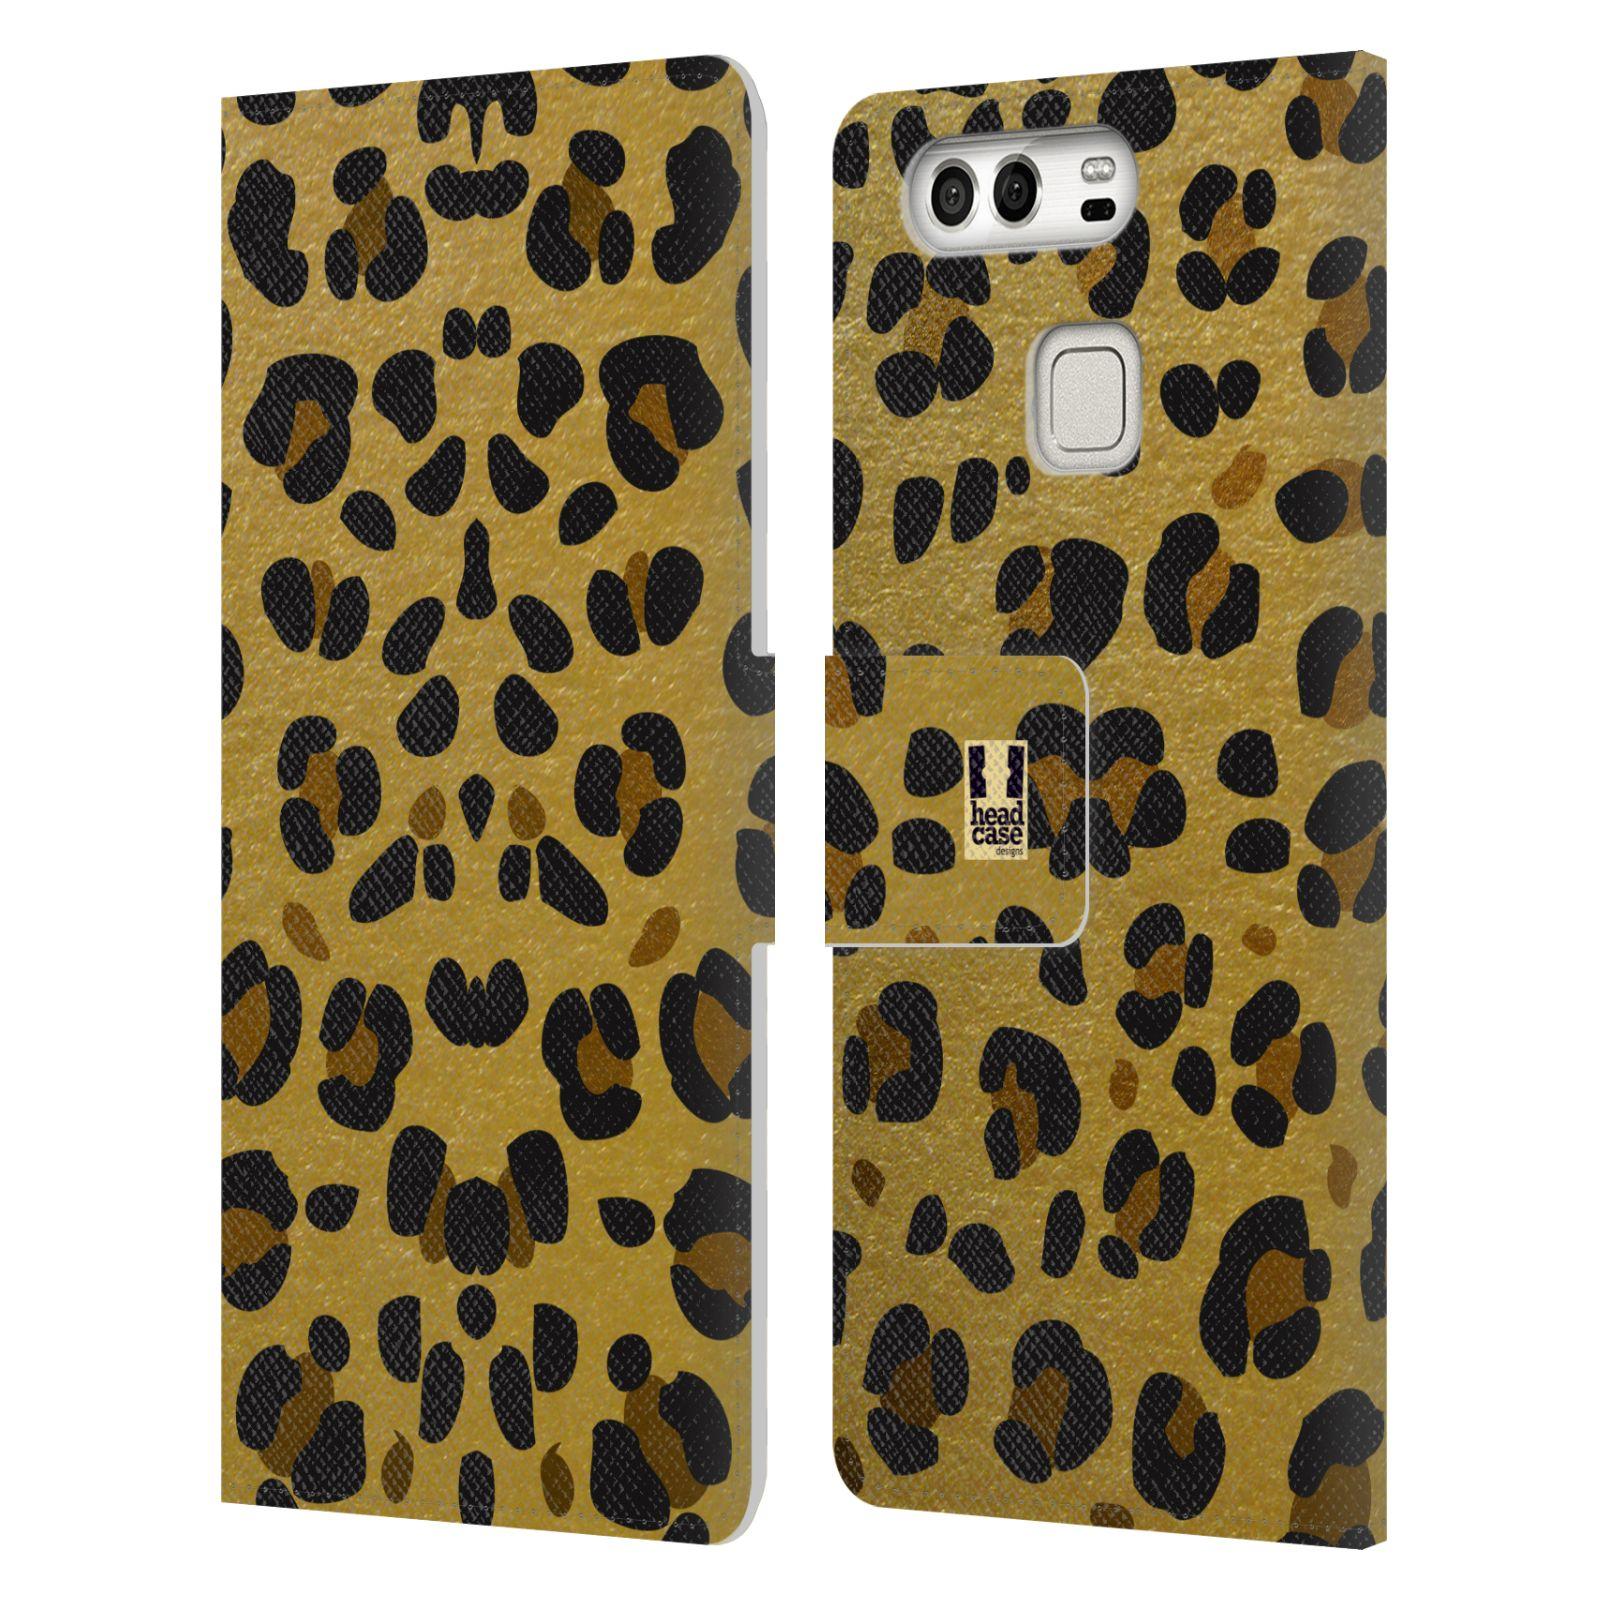 Pouzdro na mobil Huawei P9 - Head Case - Fashion zvířecí vzor